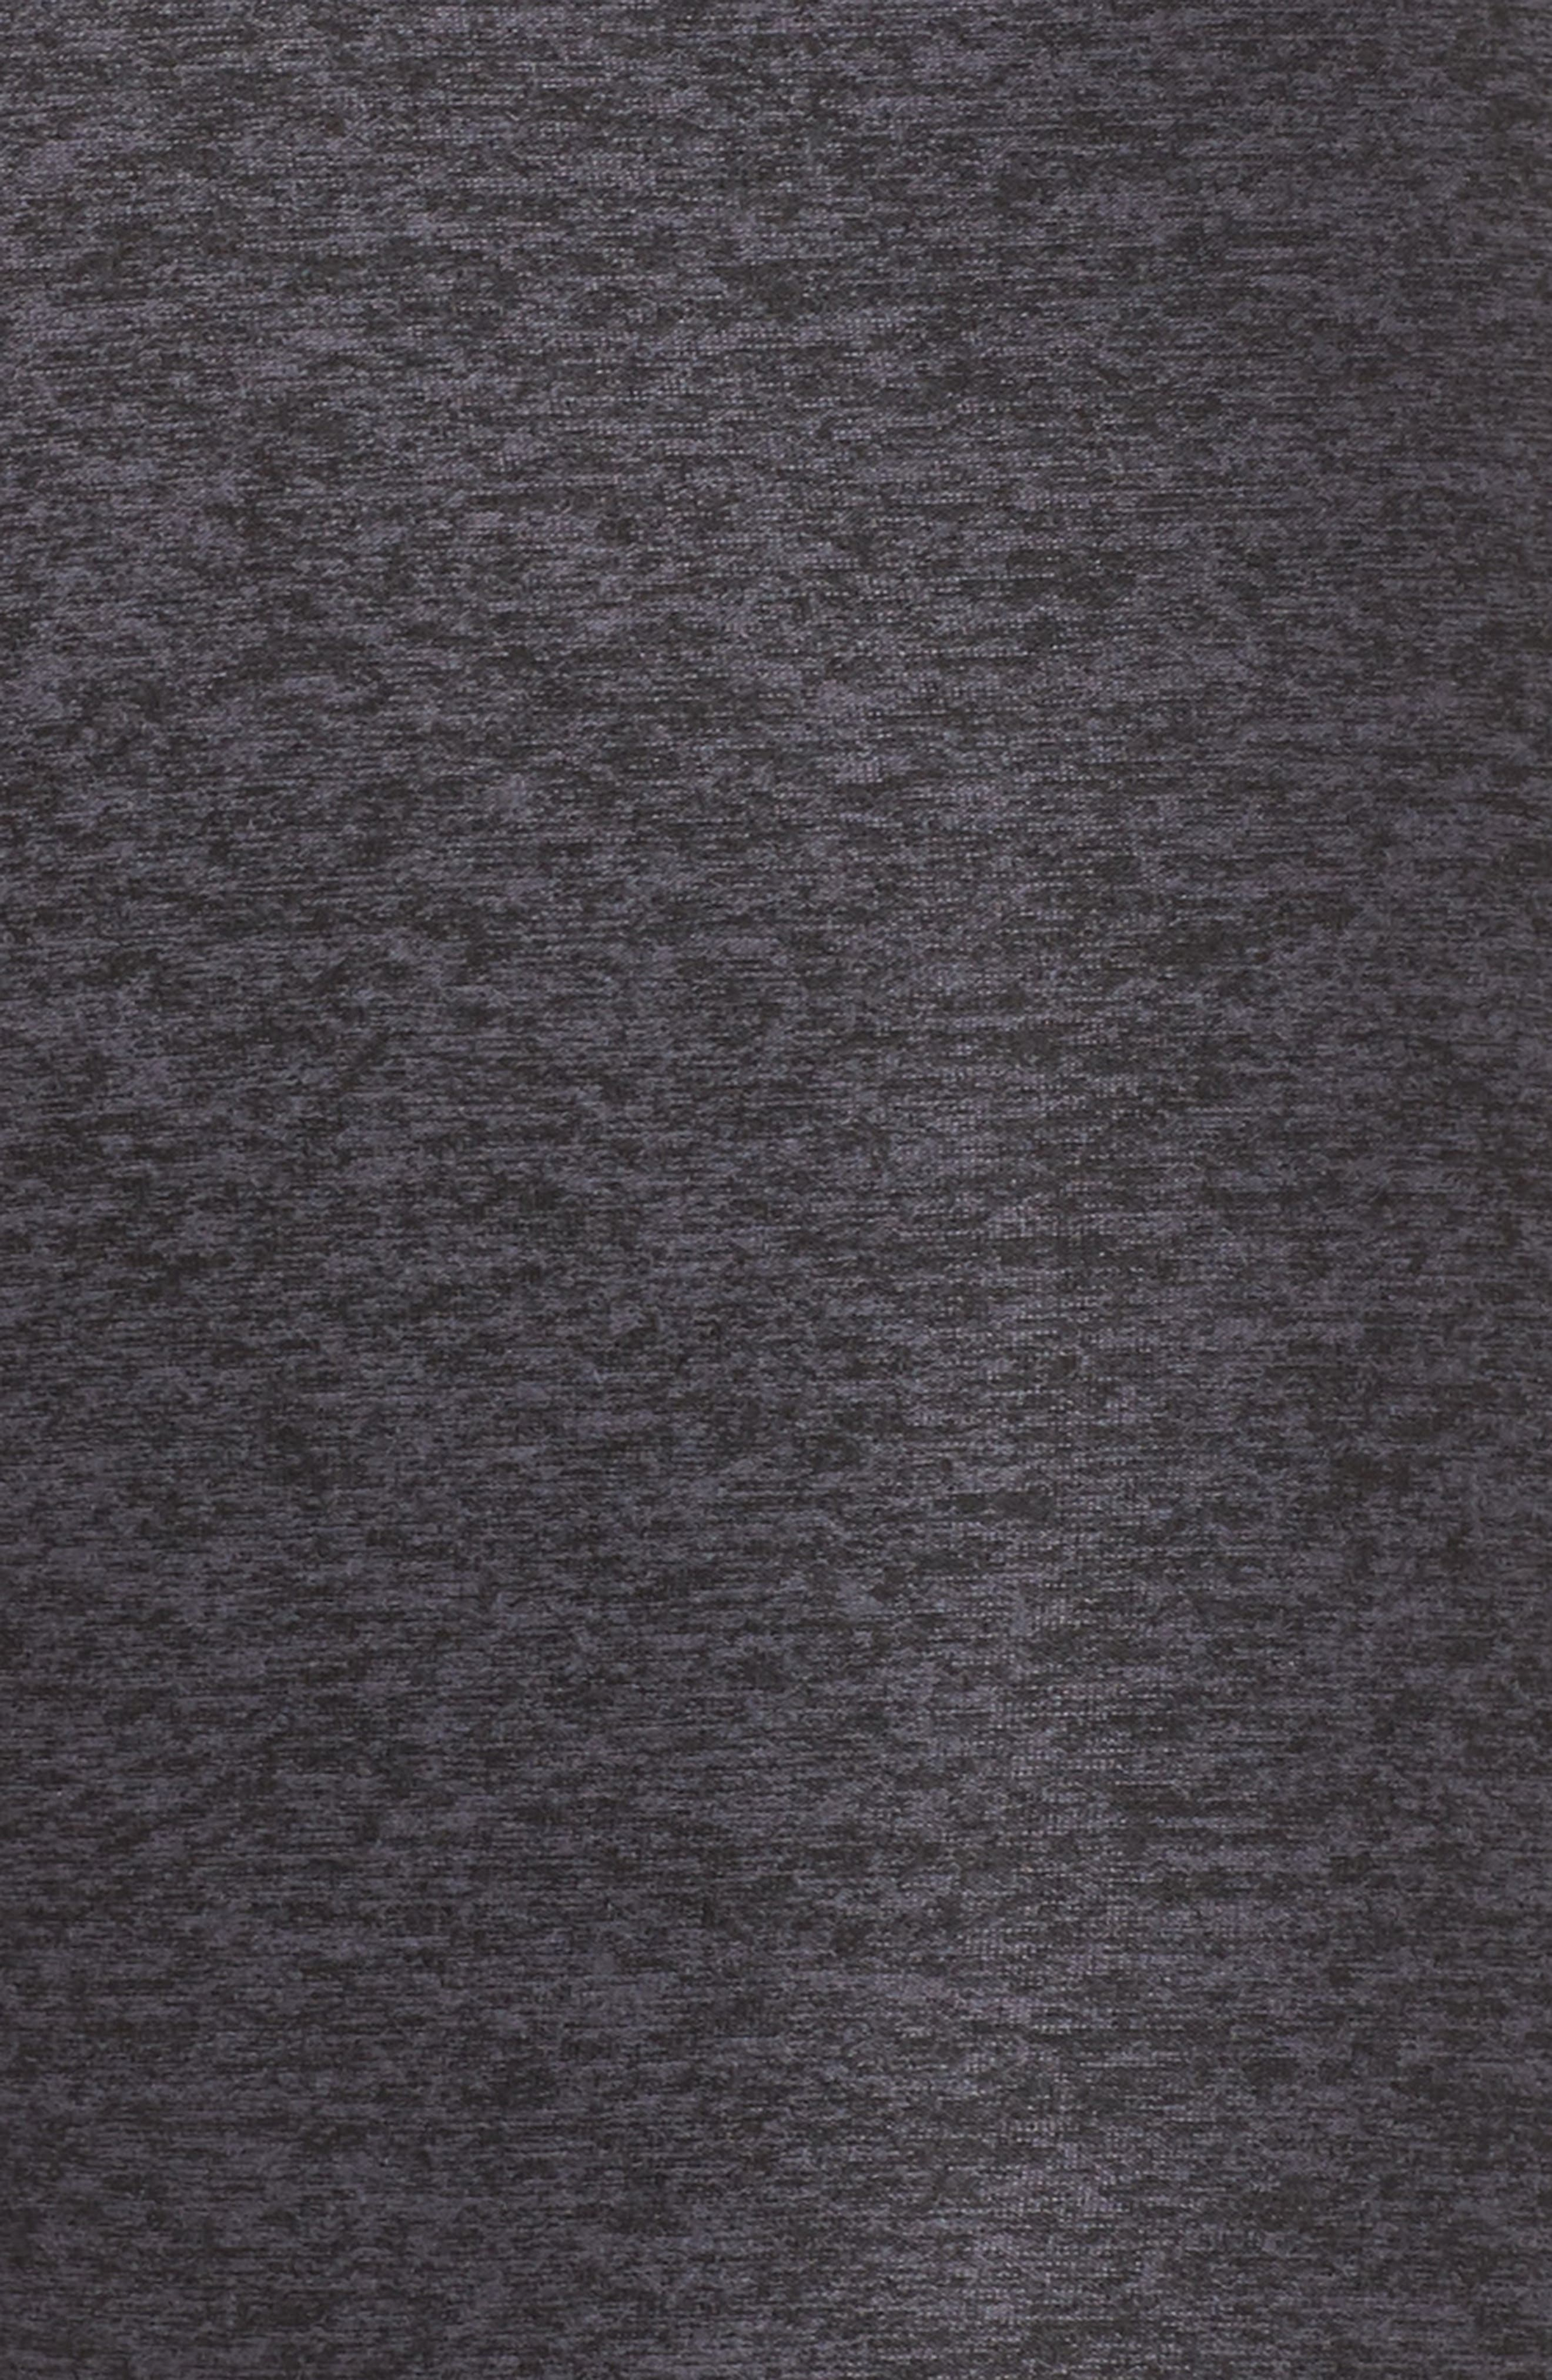 Space Dye High Waist Leggings,                             Alternate thumbnail 4, color,                             Black Steel Ombre